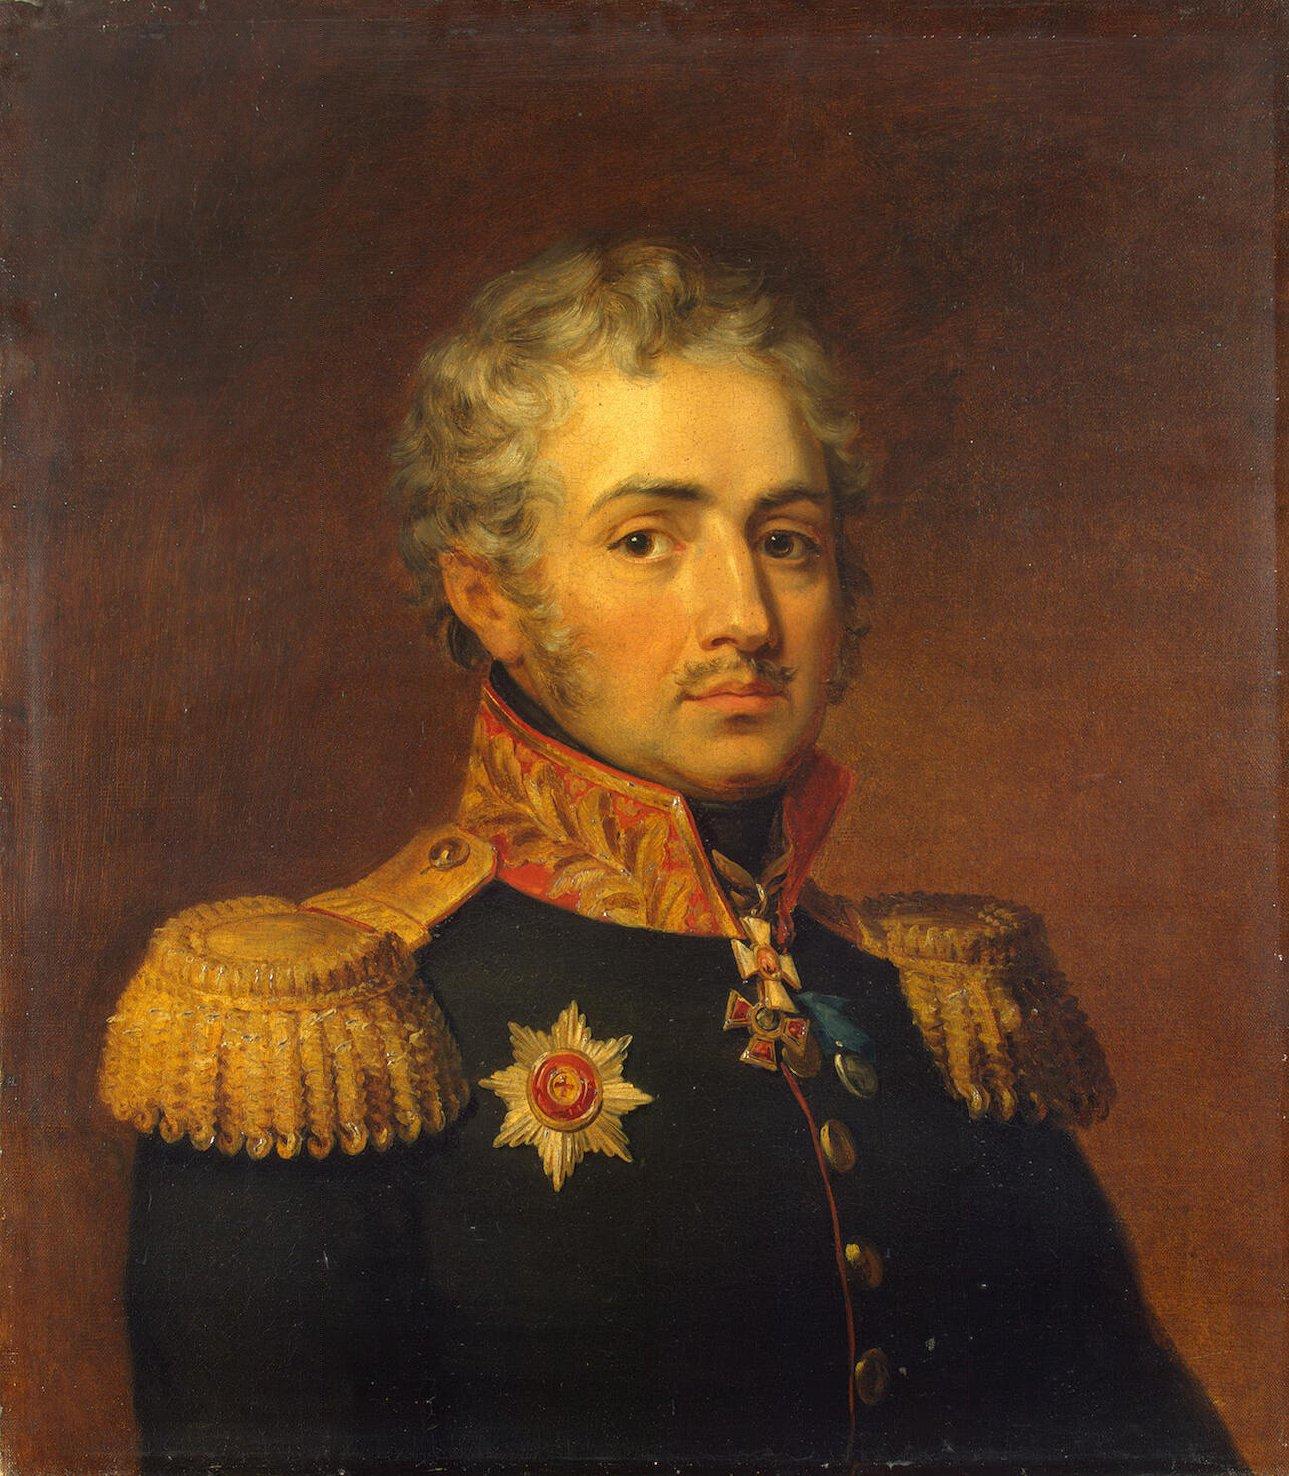 Шевич, Иван Егорович